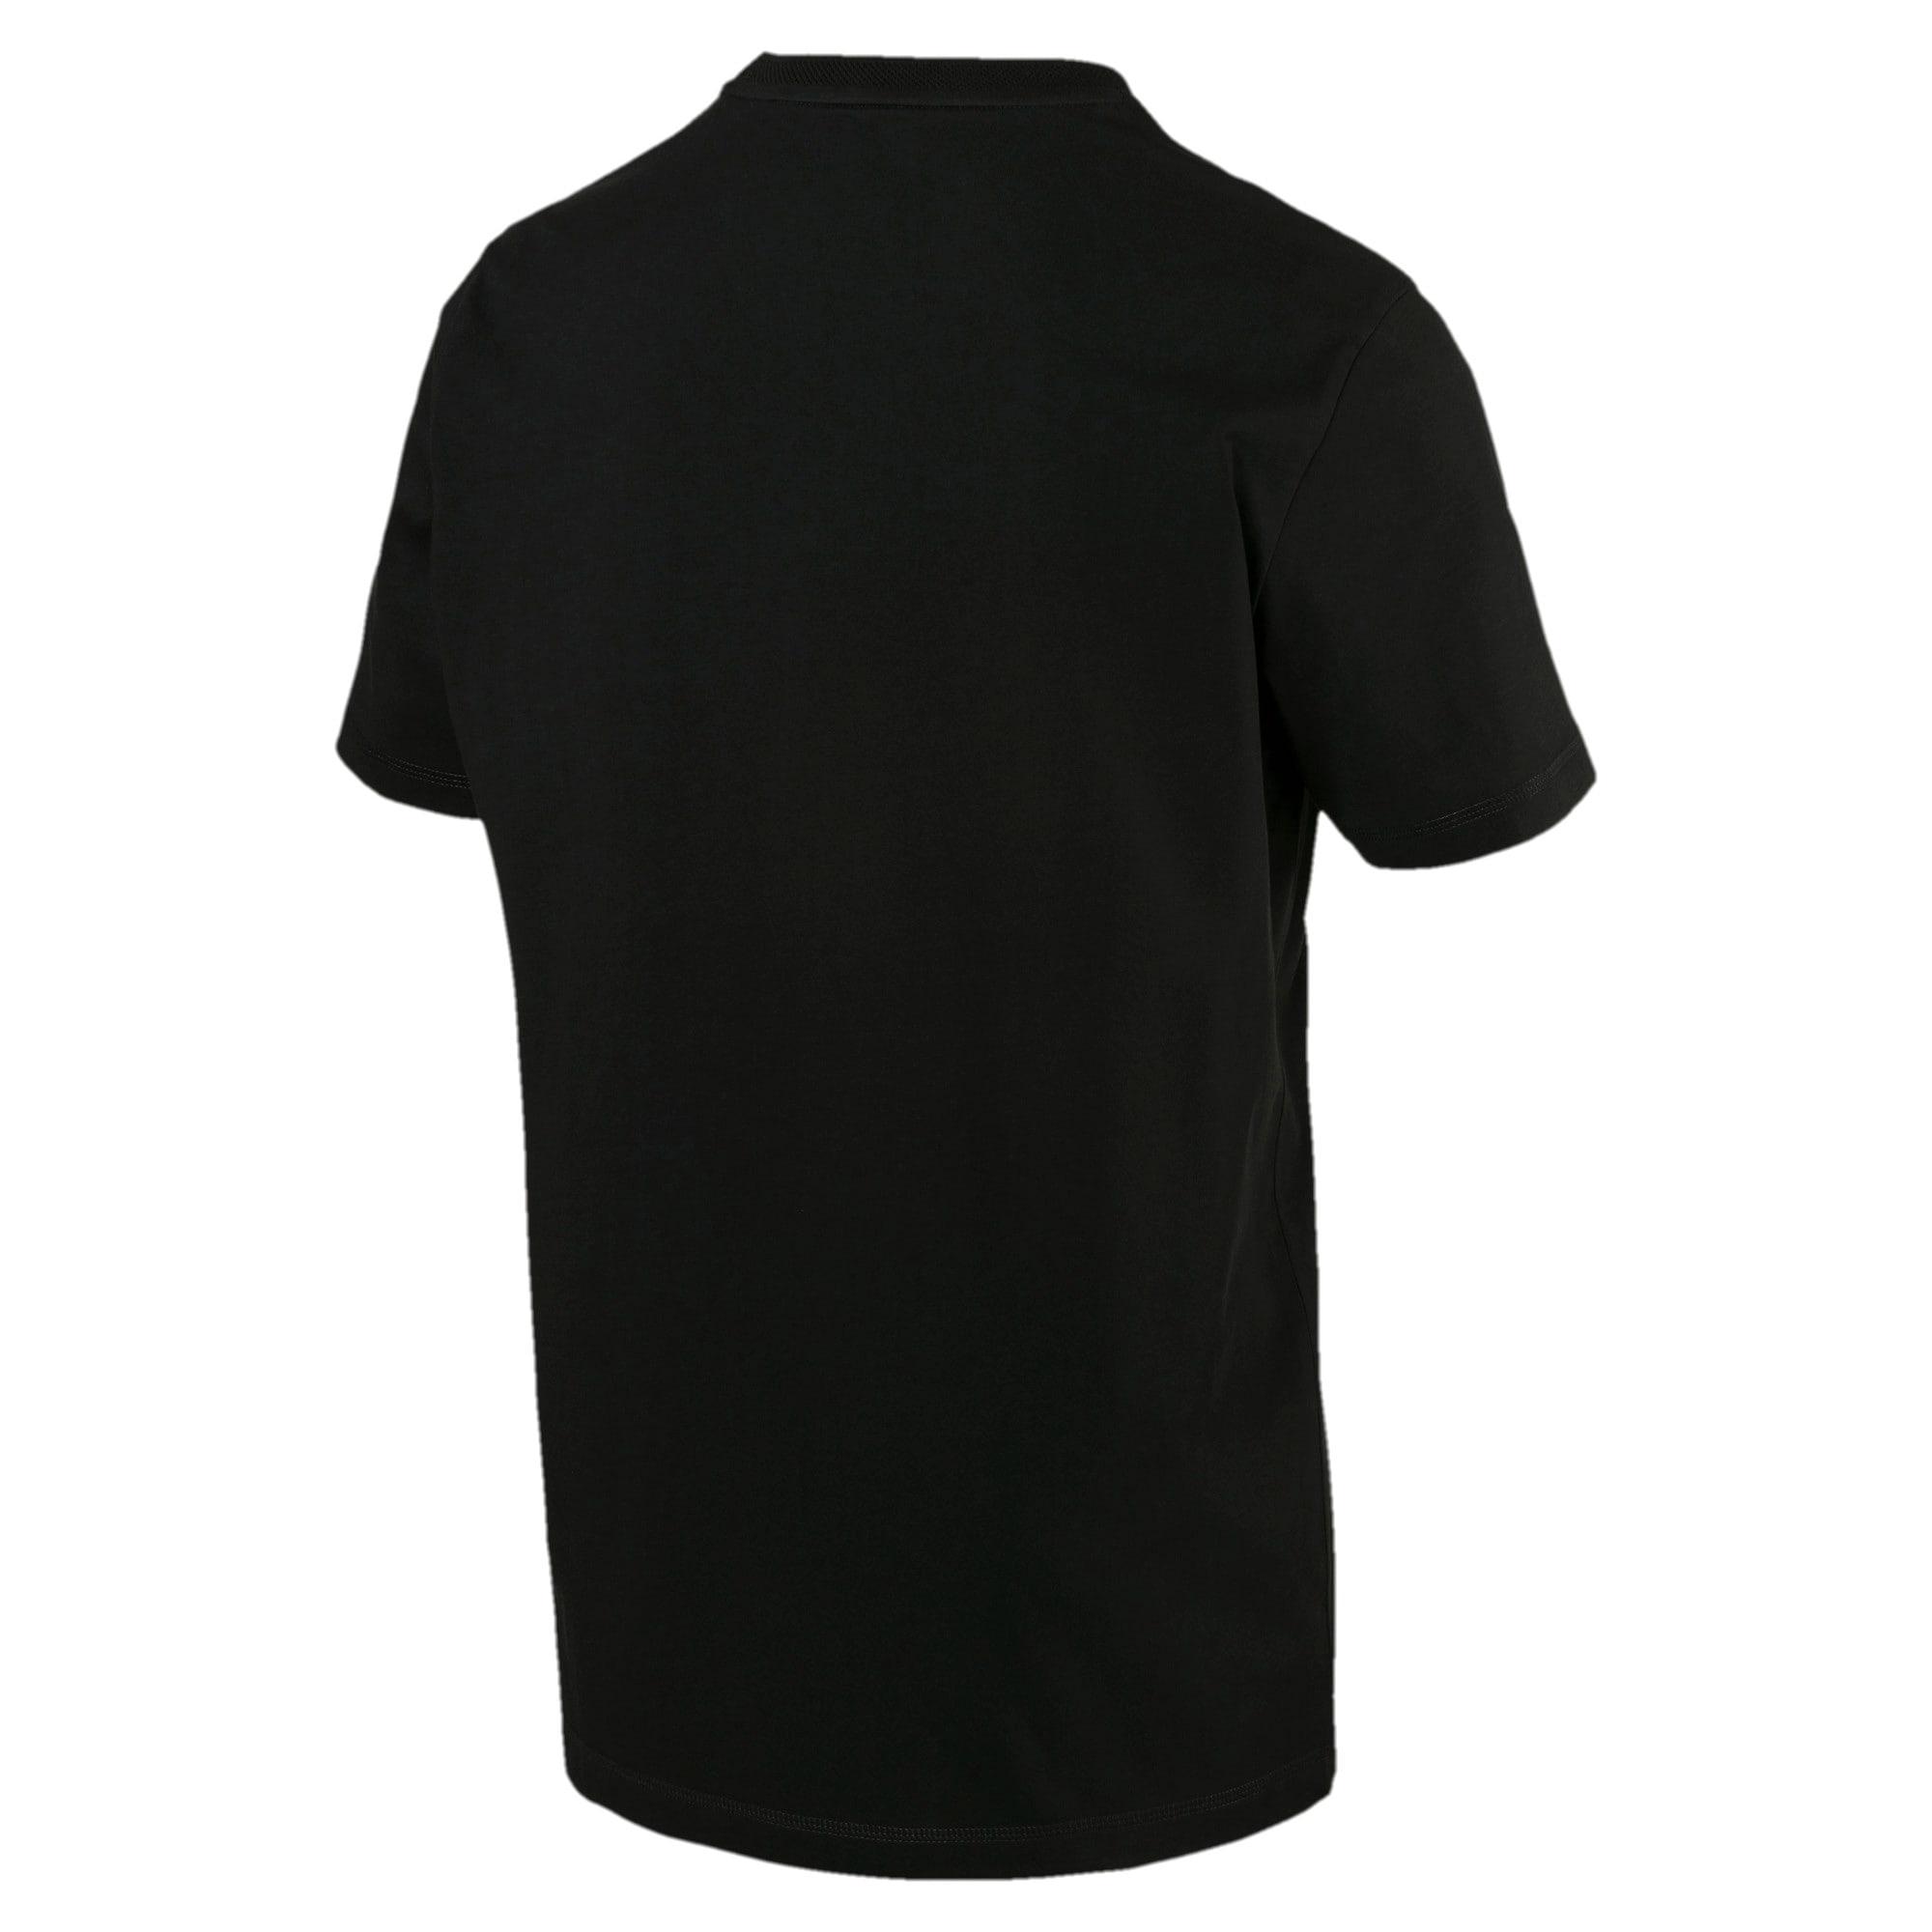 Thumbnail 2 of Fusion Herren T-Shirt, Cotton Black, medium